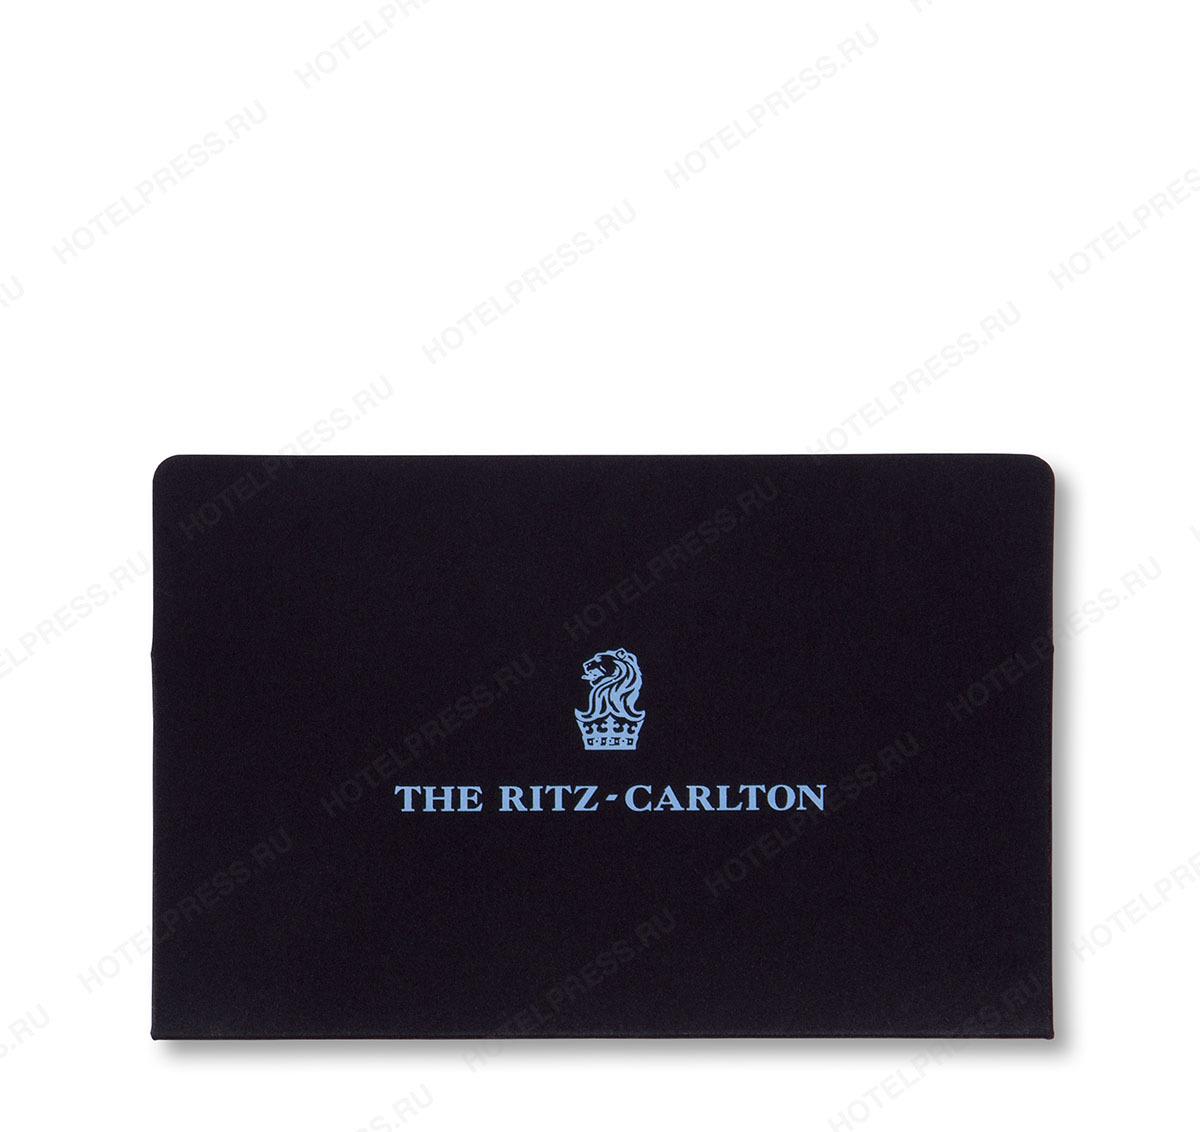 Кардхолдер для ключ карты от номера отеля THE RITZ-CARLTON